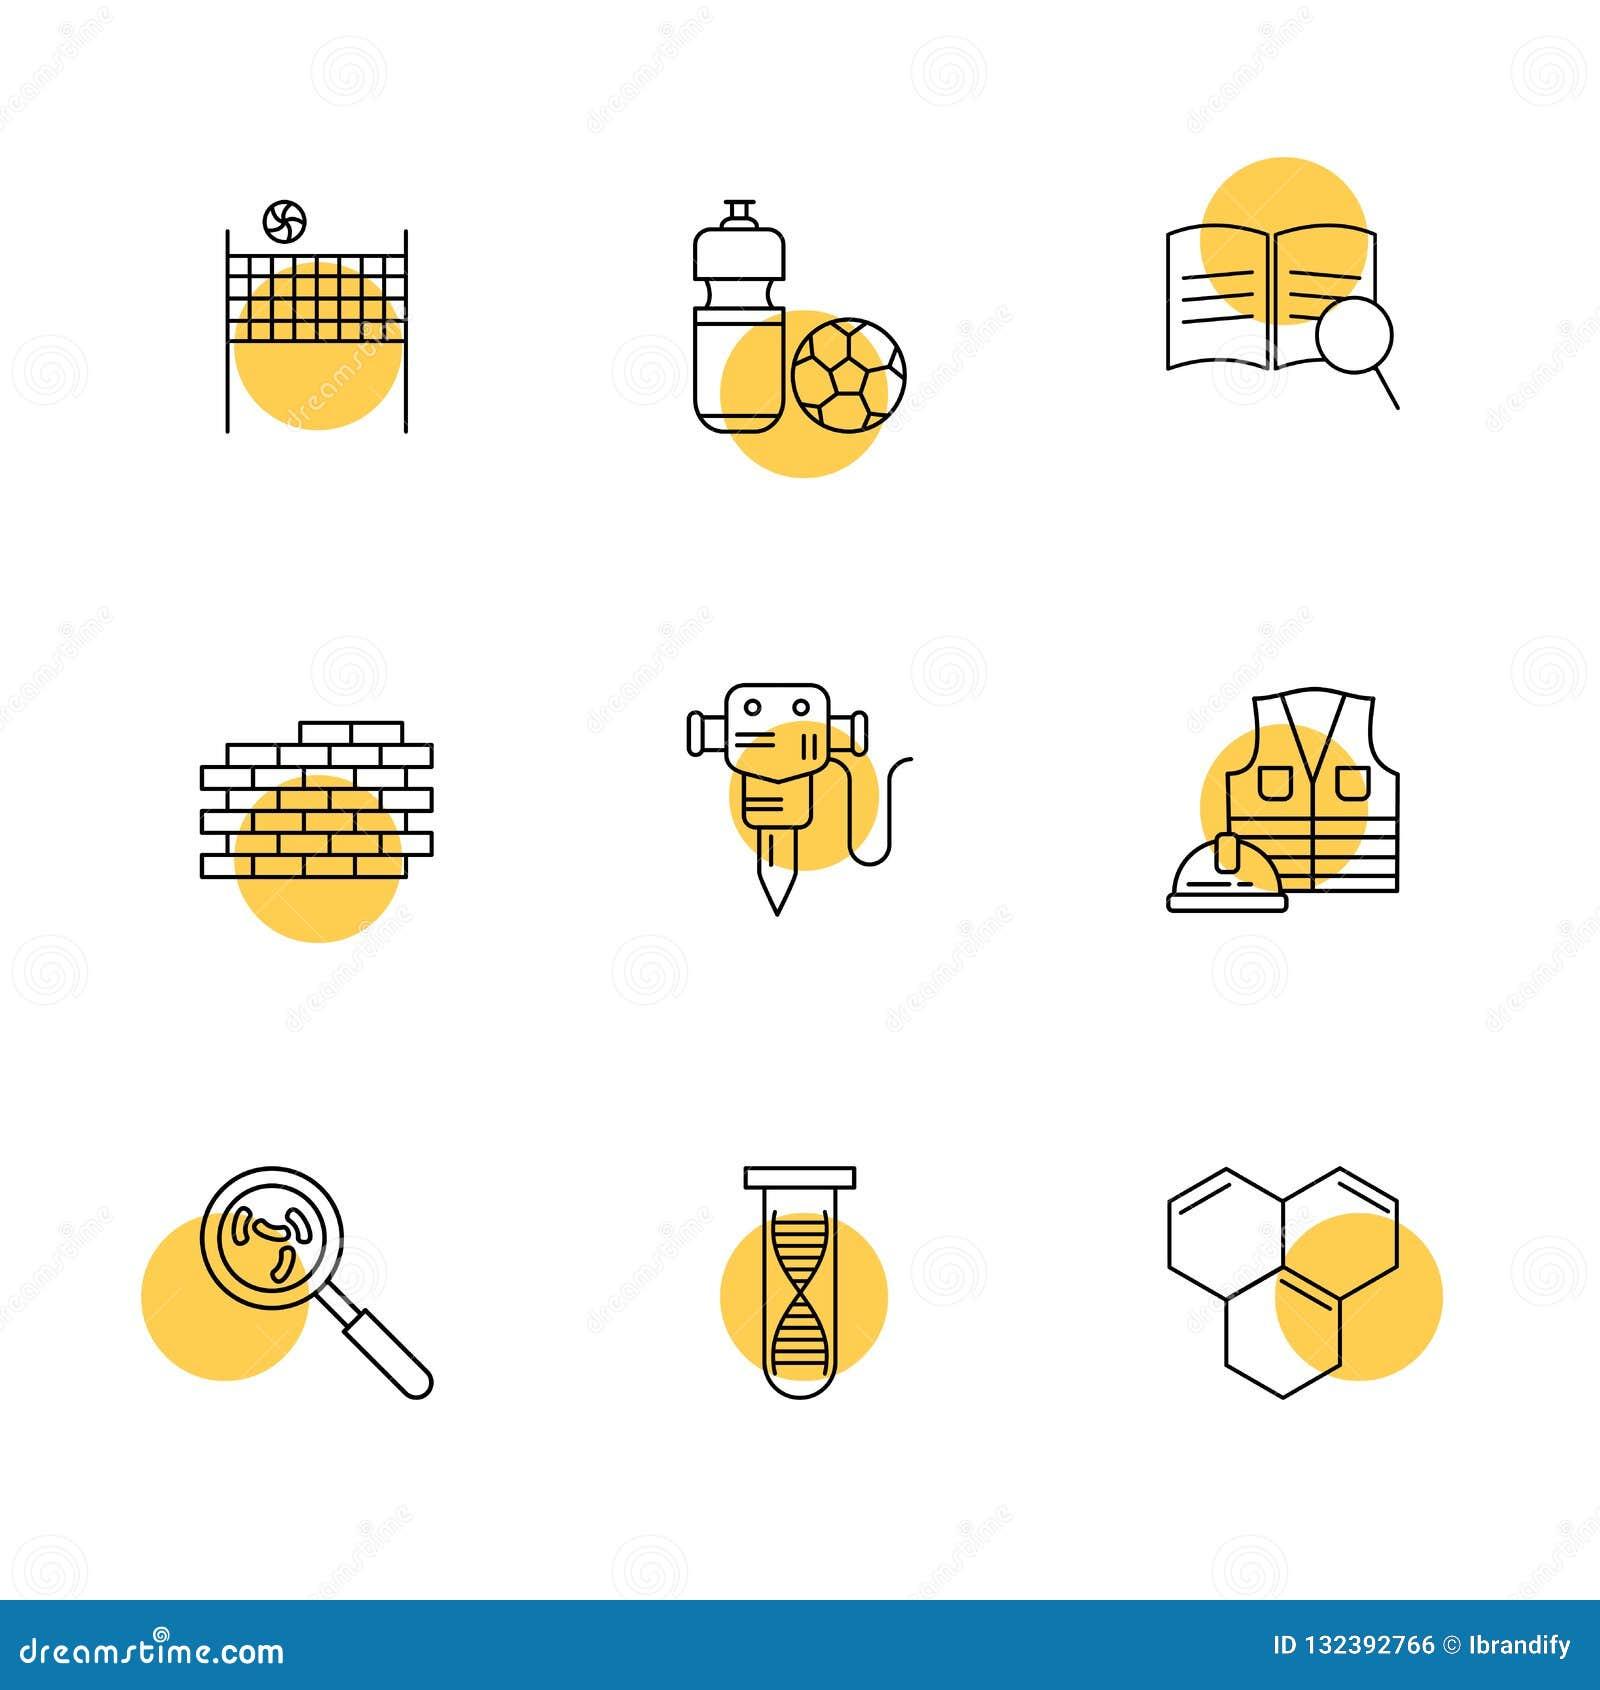 шарик залпа, сеть, шарик, кирпичи, стена, jackhammer, работа